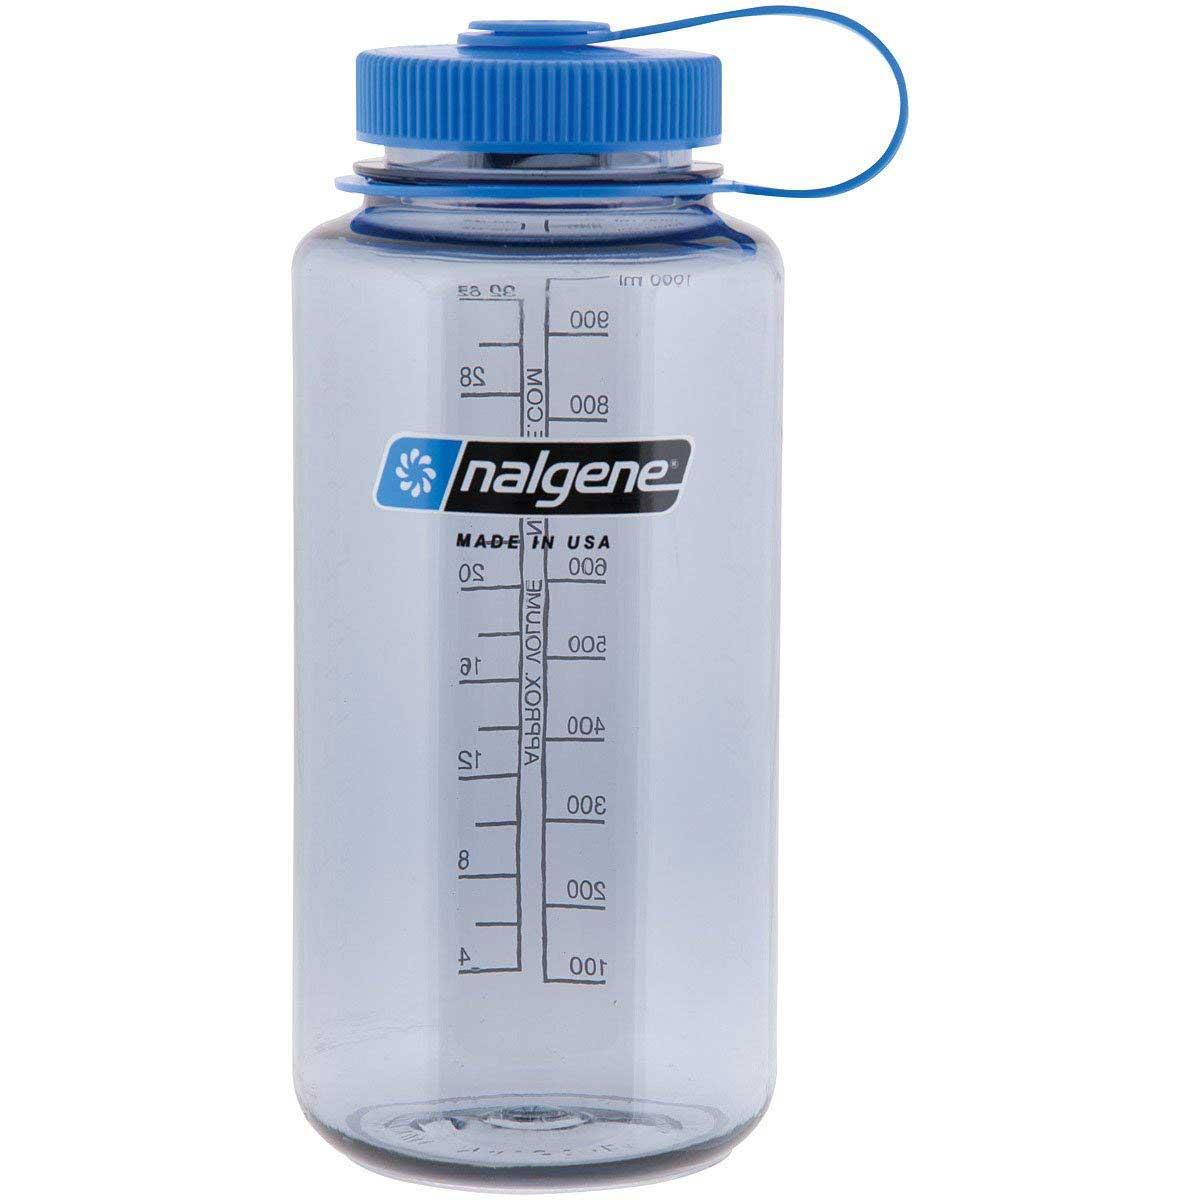 Nalgene Plastic Bottle Wide Mouth Grey